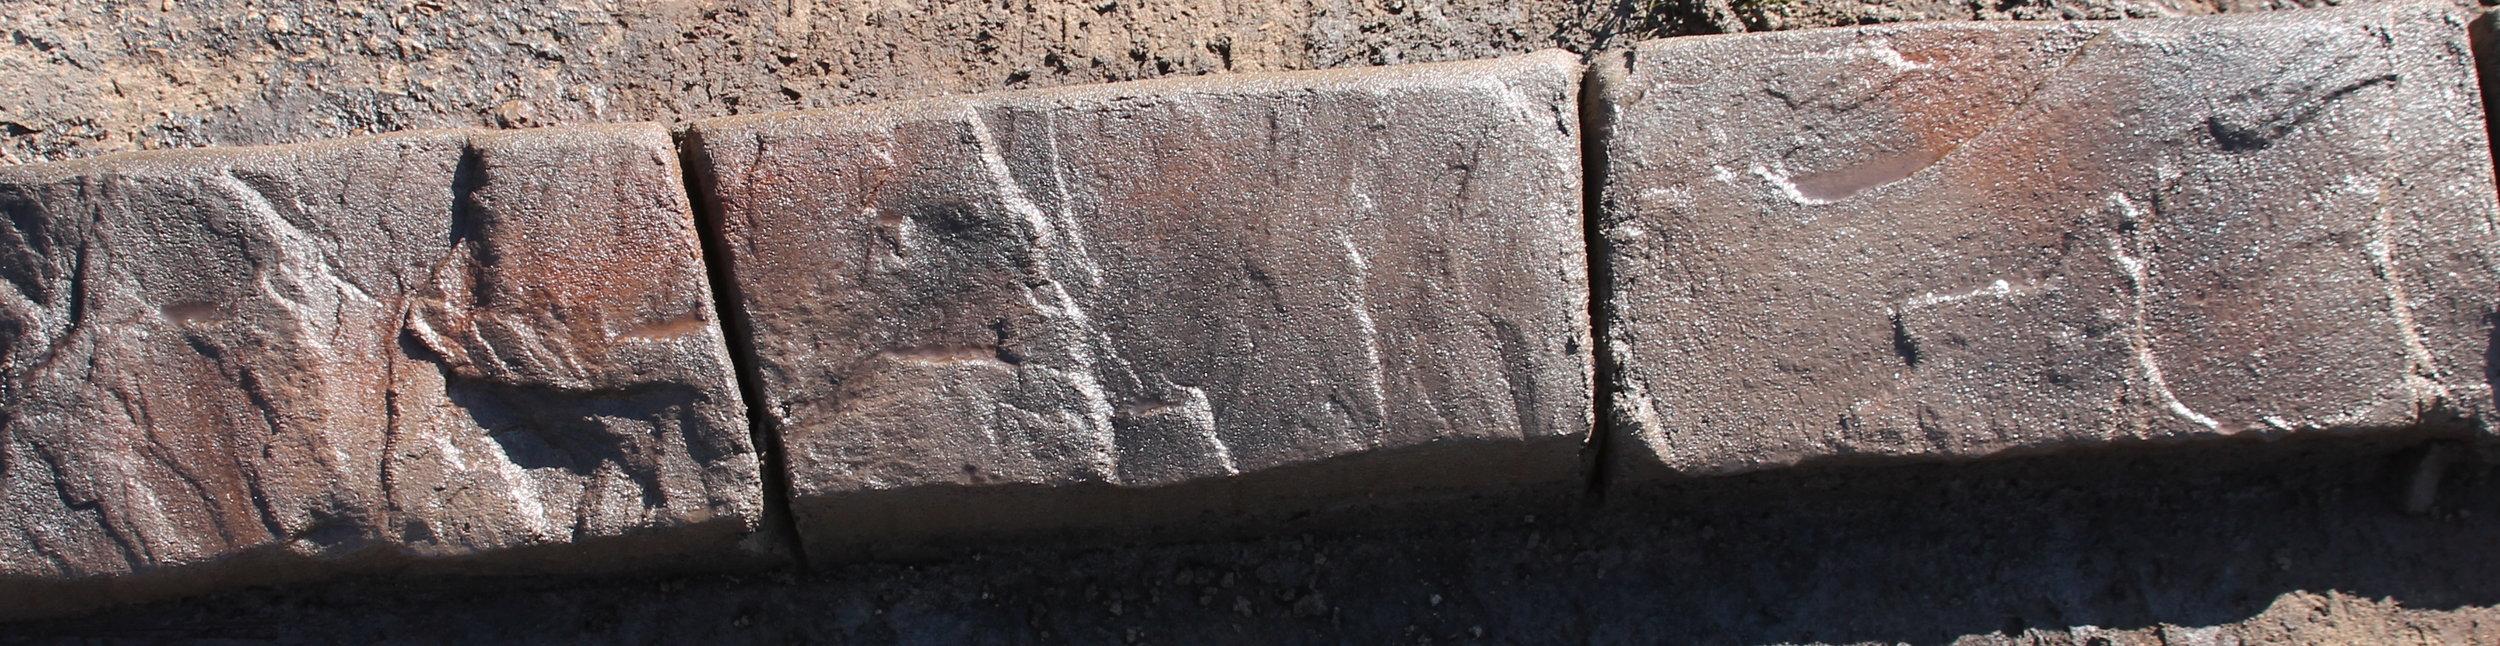 Idaho Mountain Stone 2.JPG